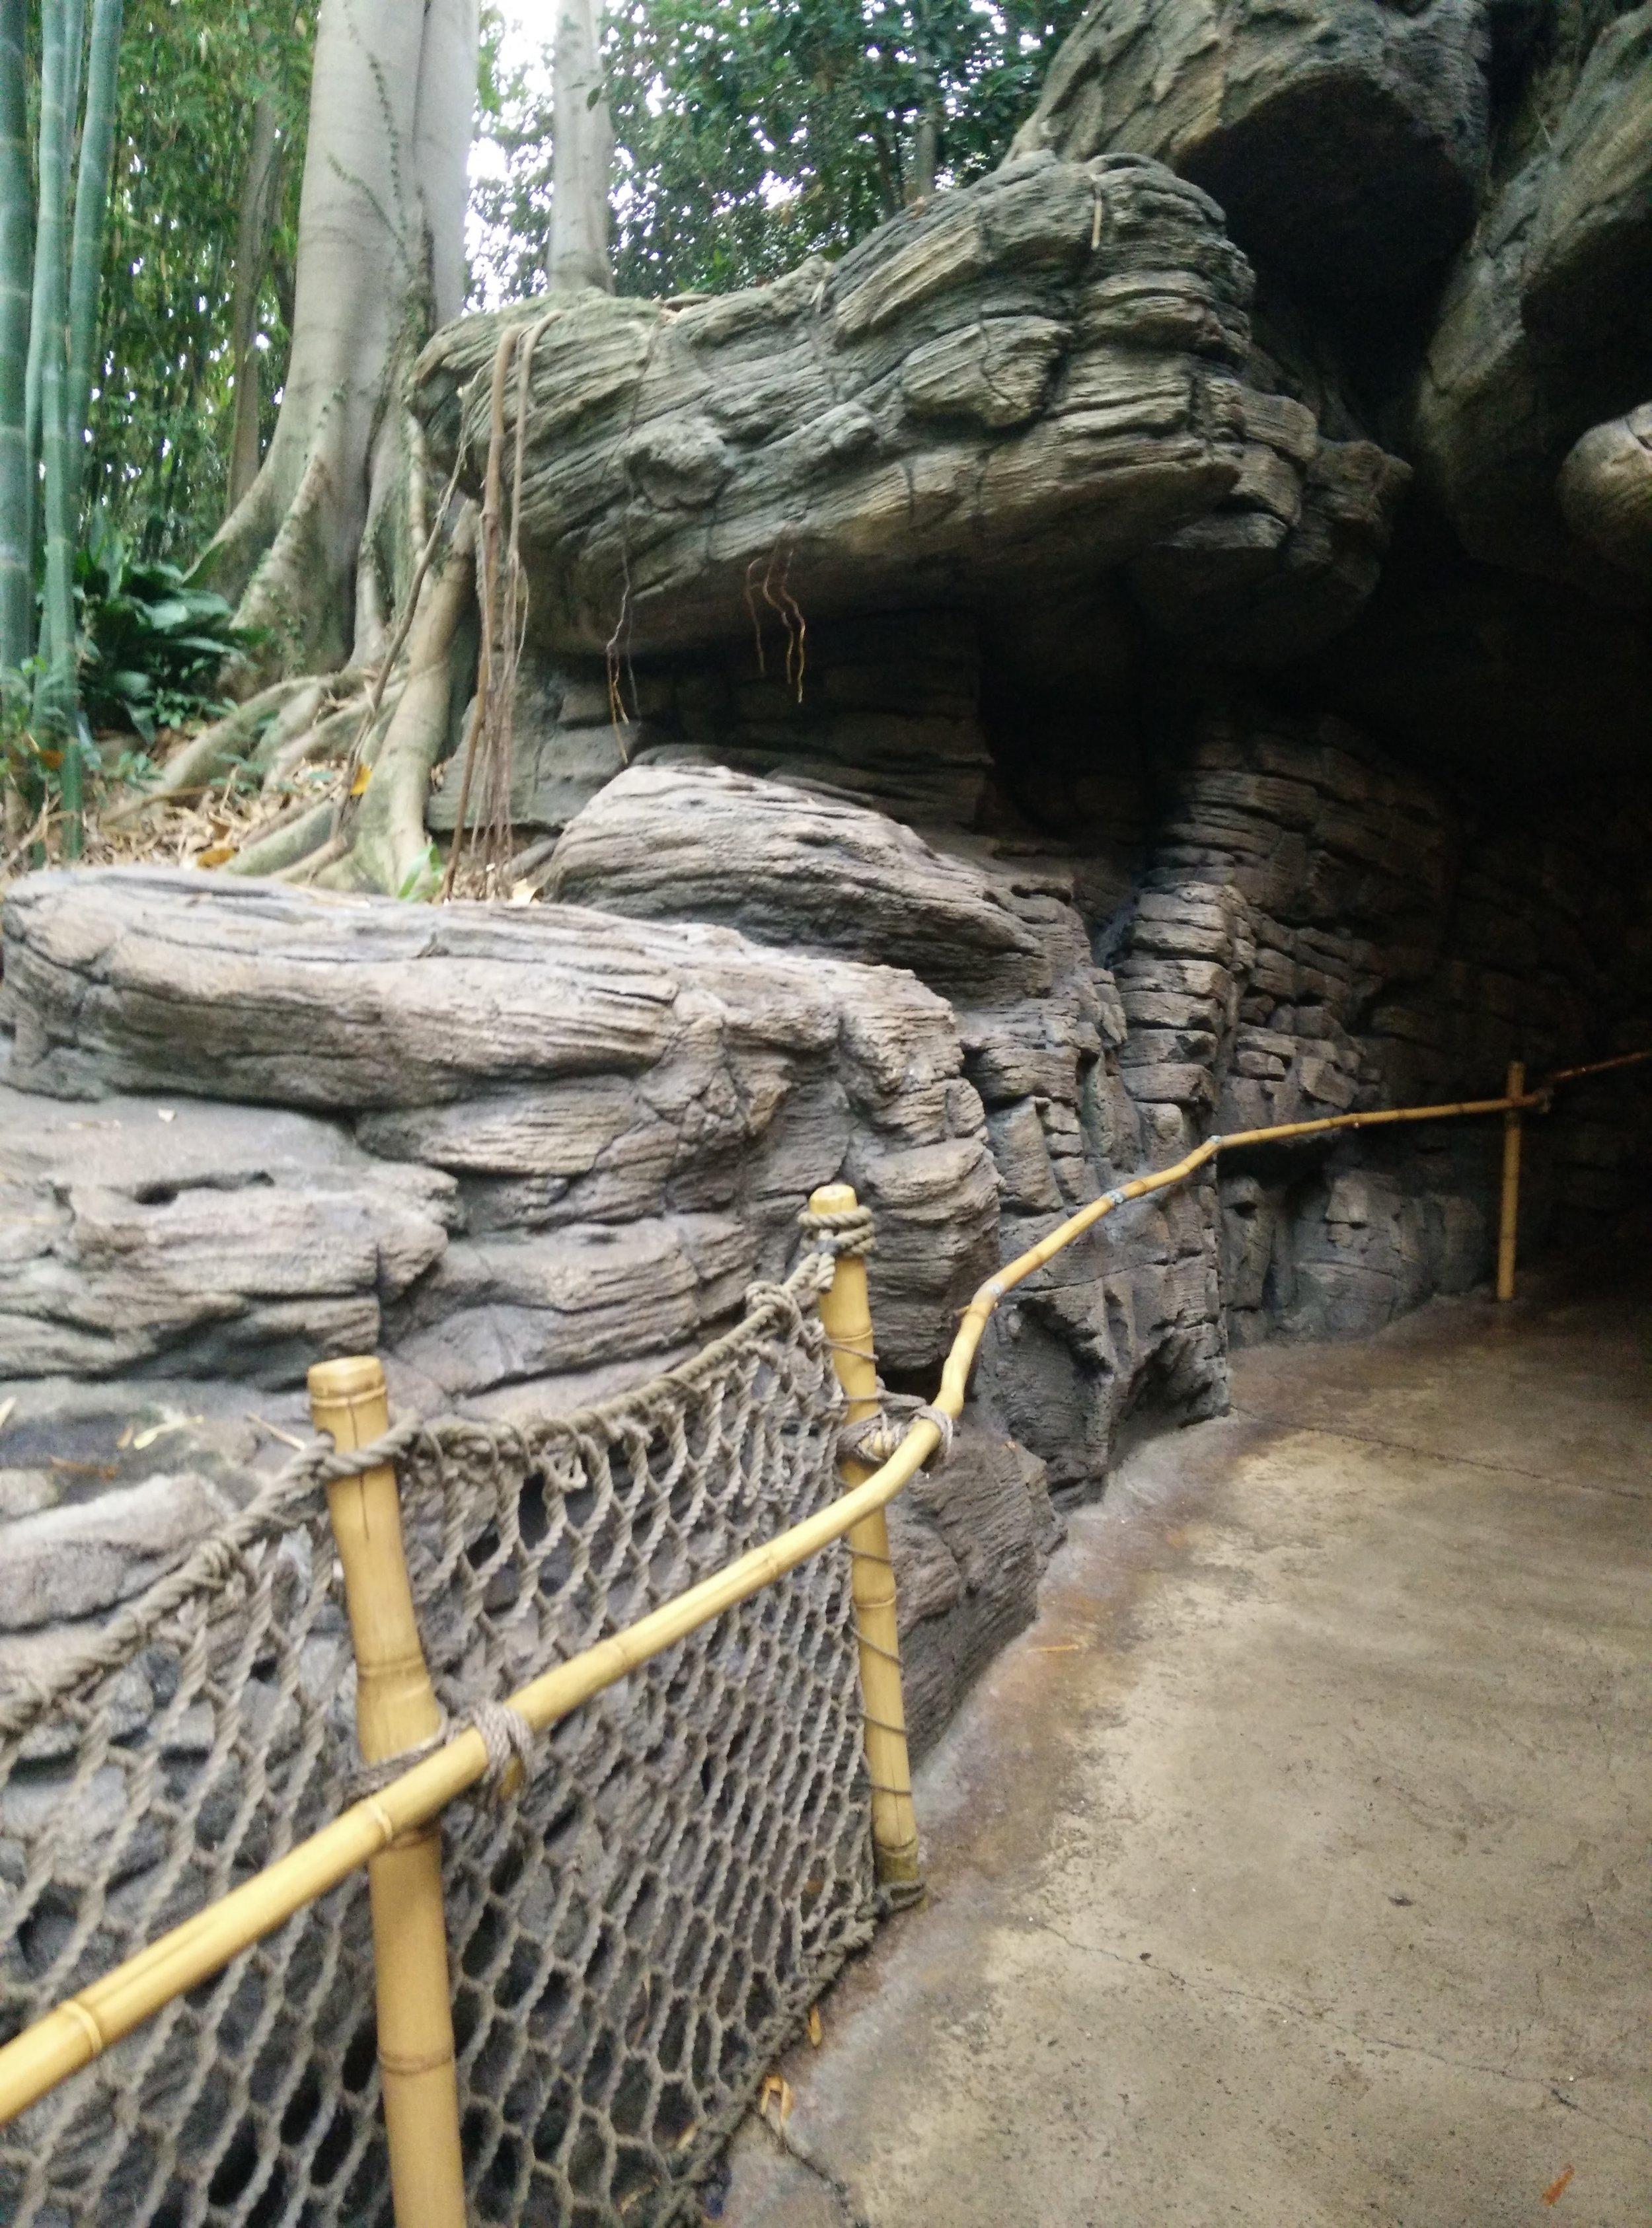 The Indiana Jones Adventure - Disneyland